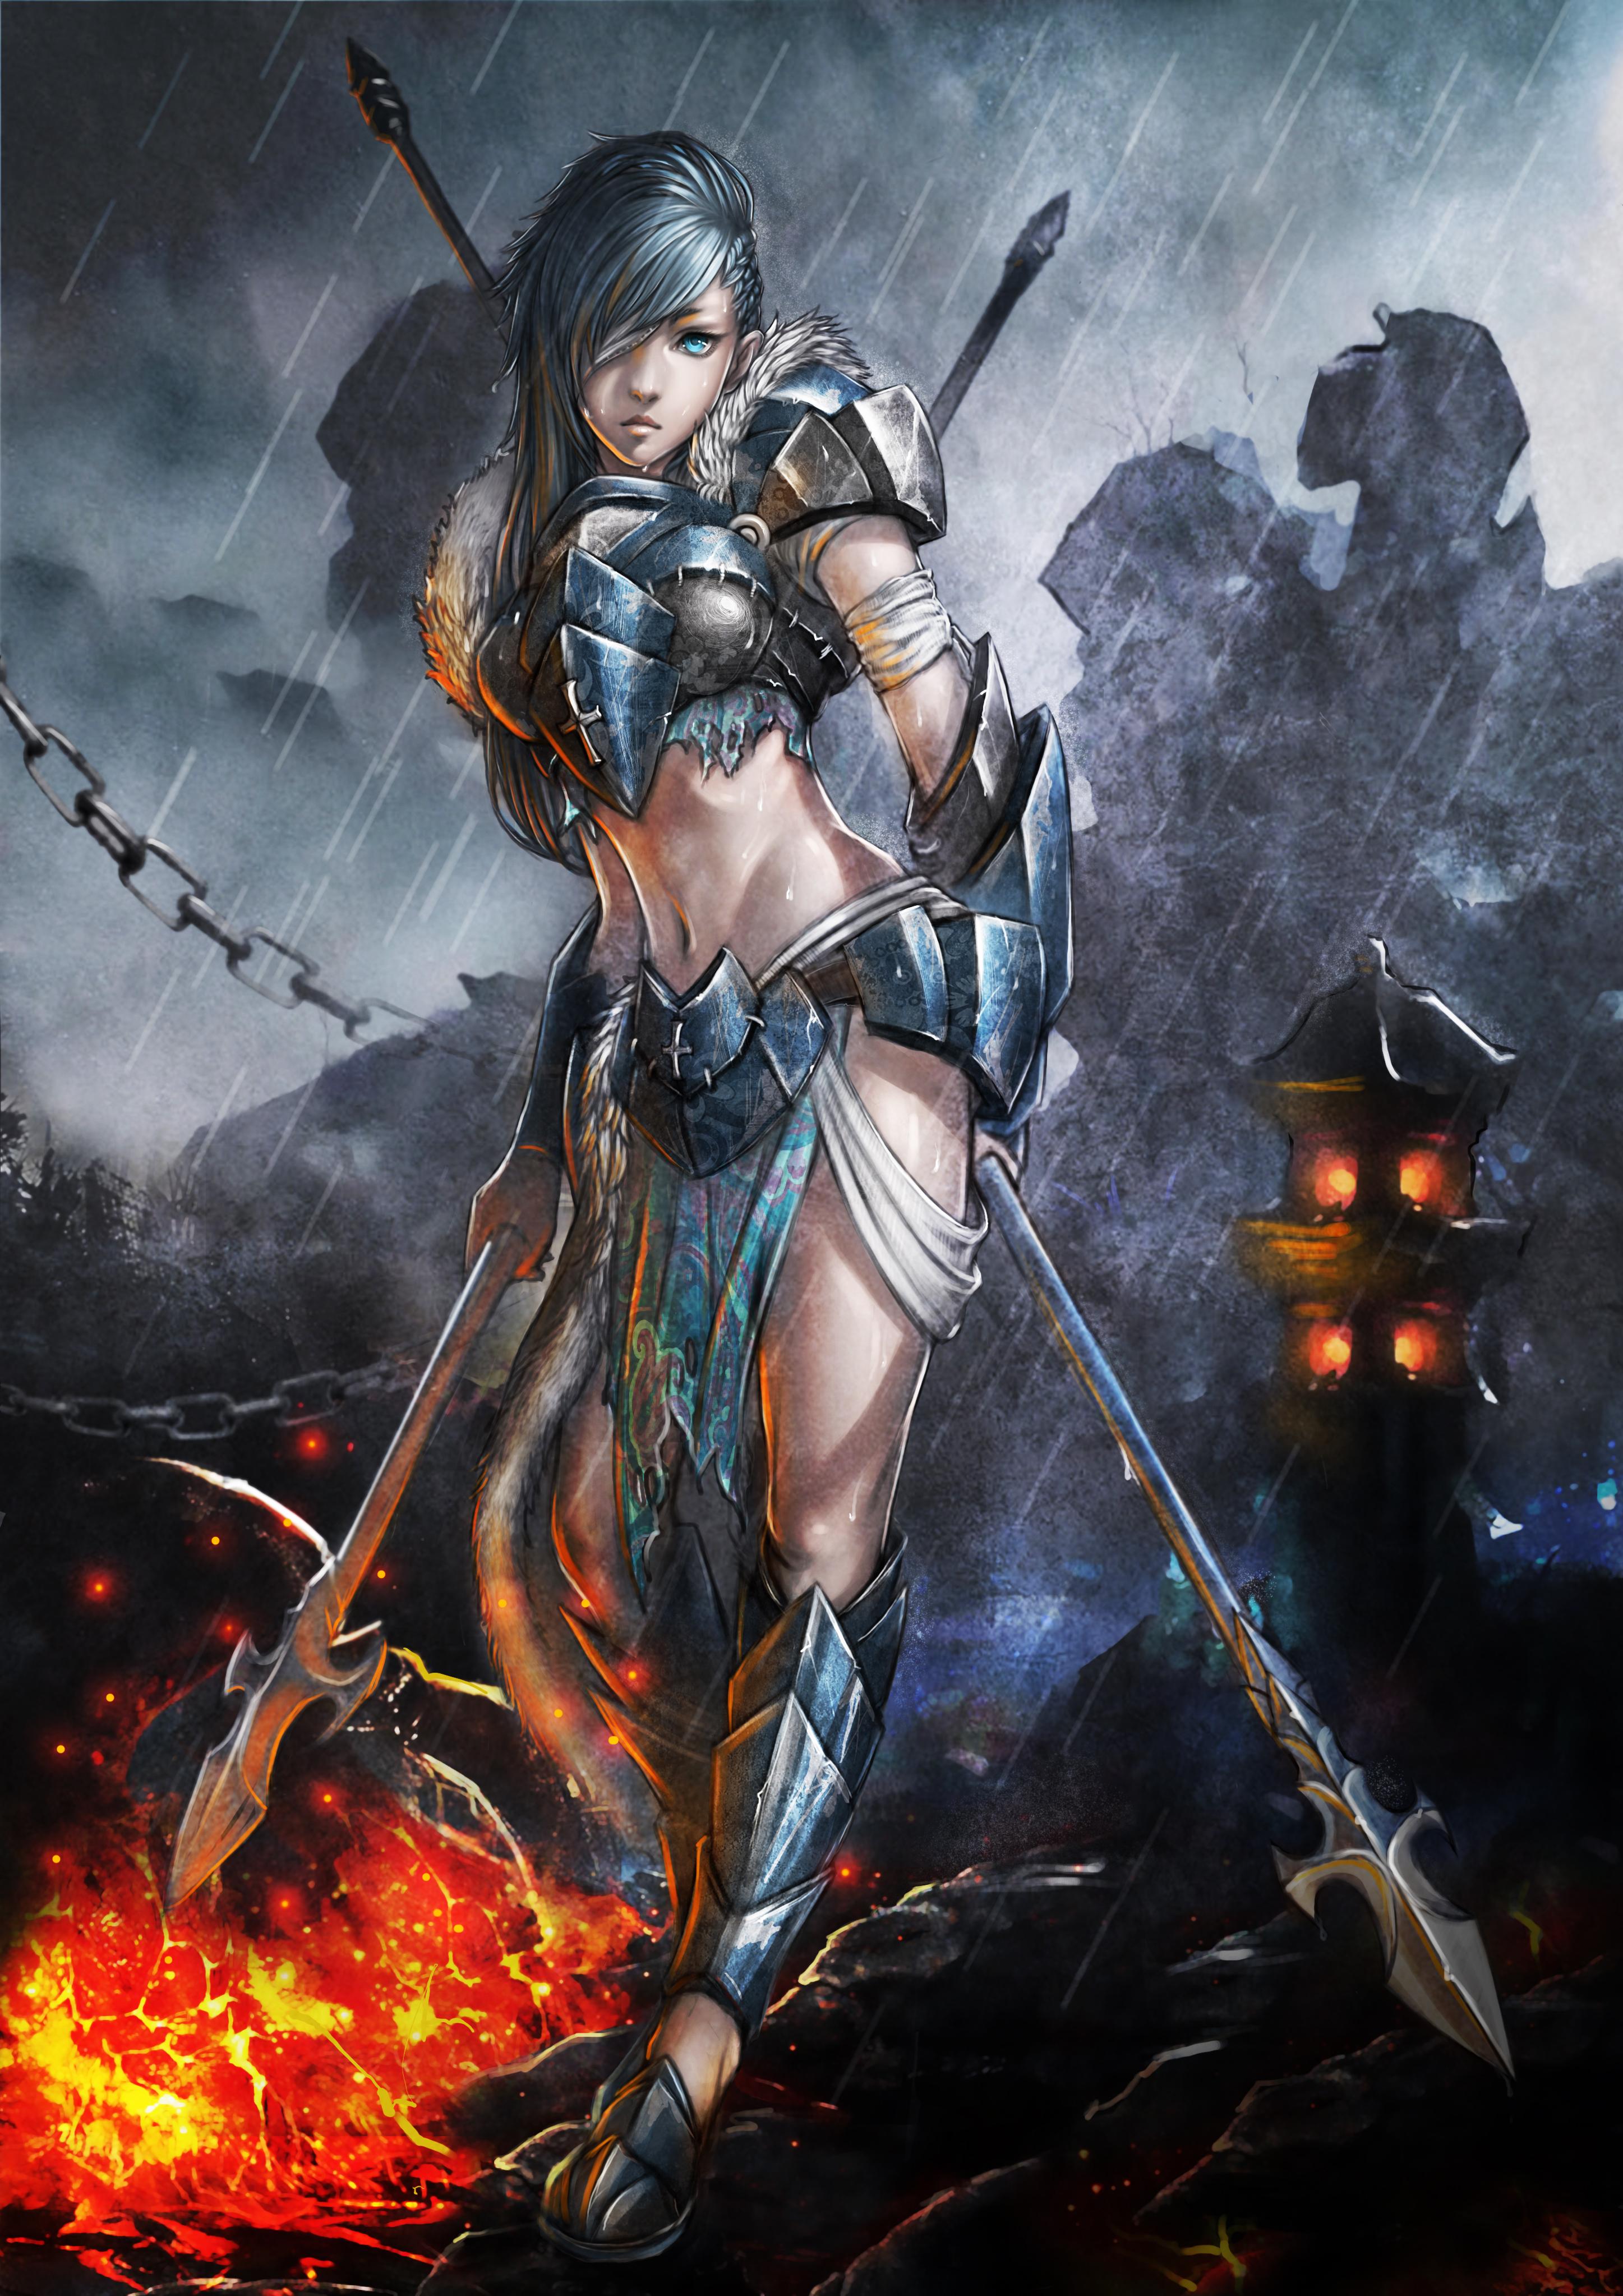 Girls in armor hentai photo